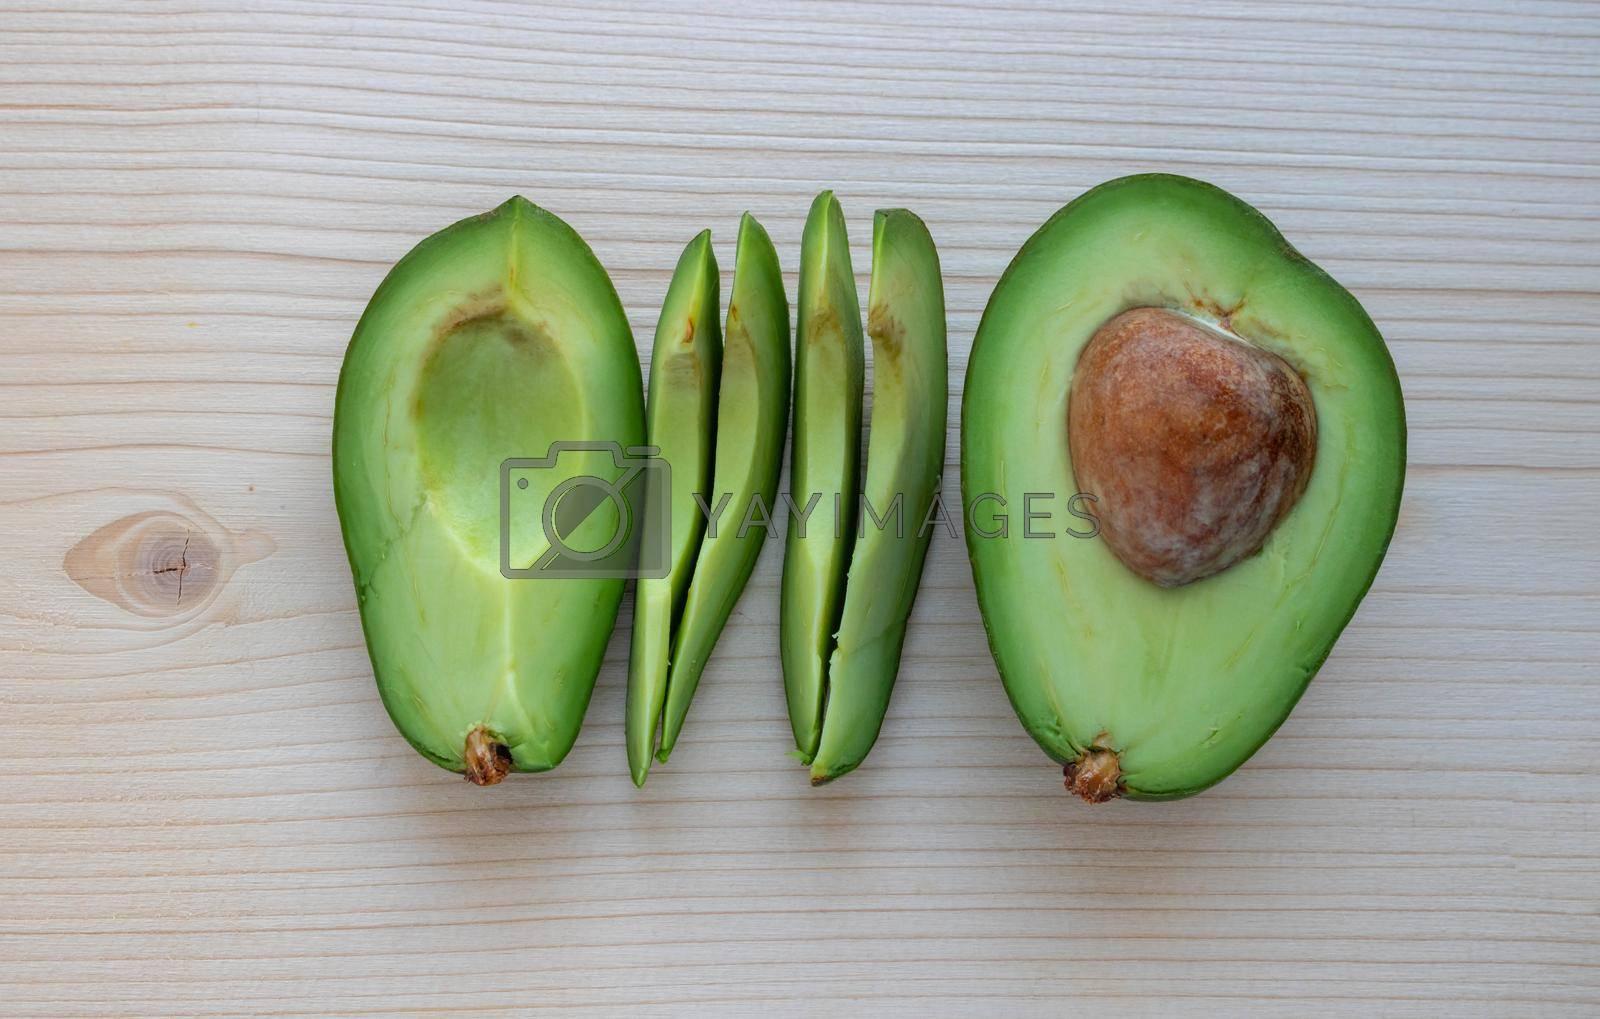 Slices of ripe avocado lie on a light cutting board by lapushka62